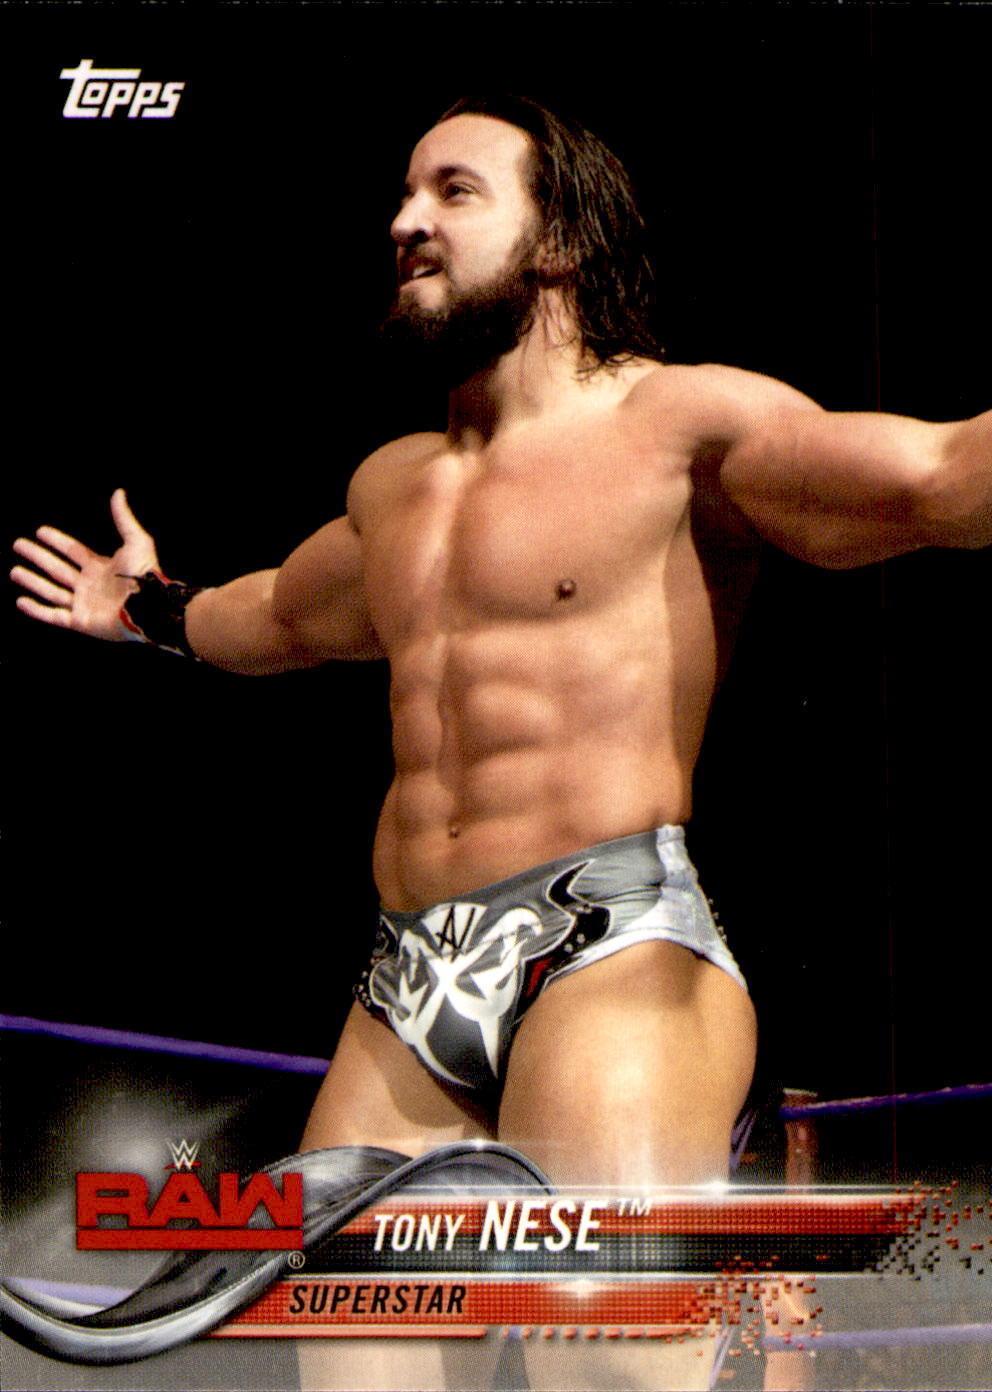 2018 WWE Wrestling Cards (Topps) Tony Nese (No.92)